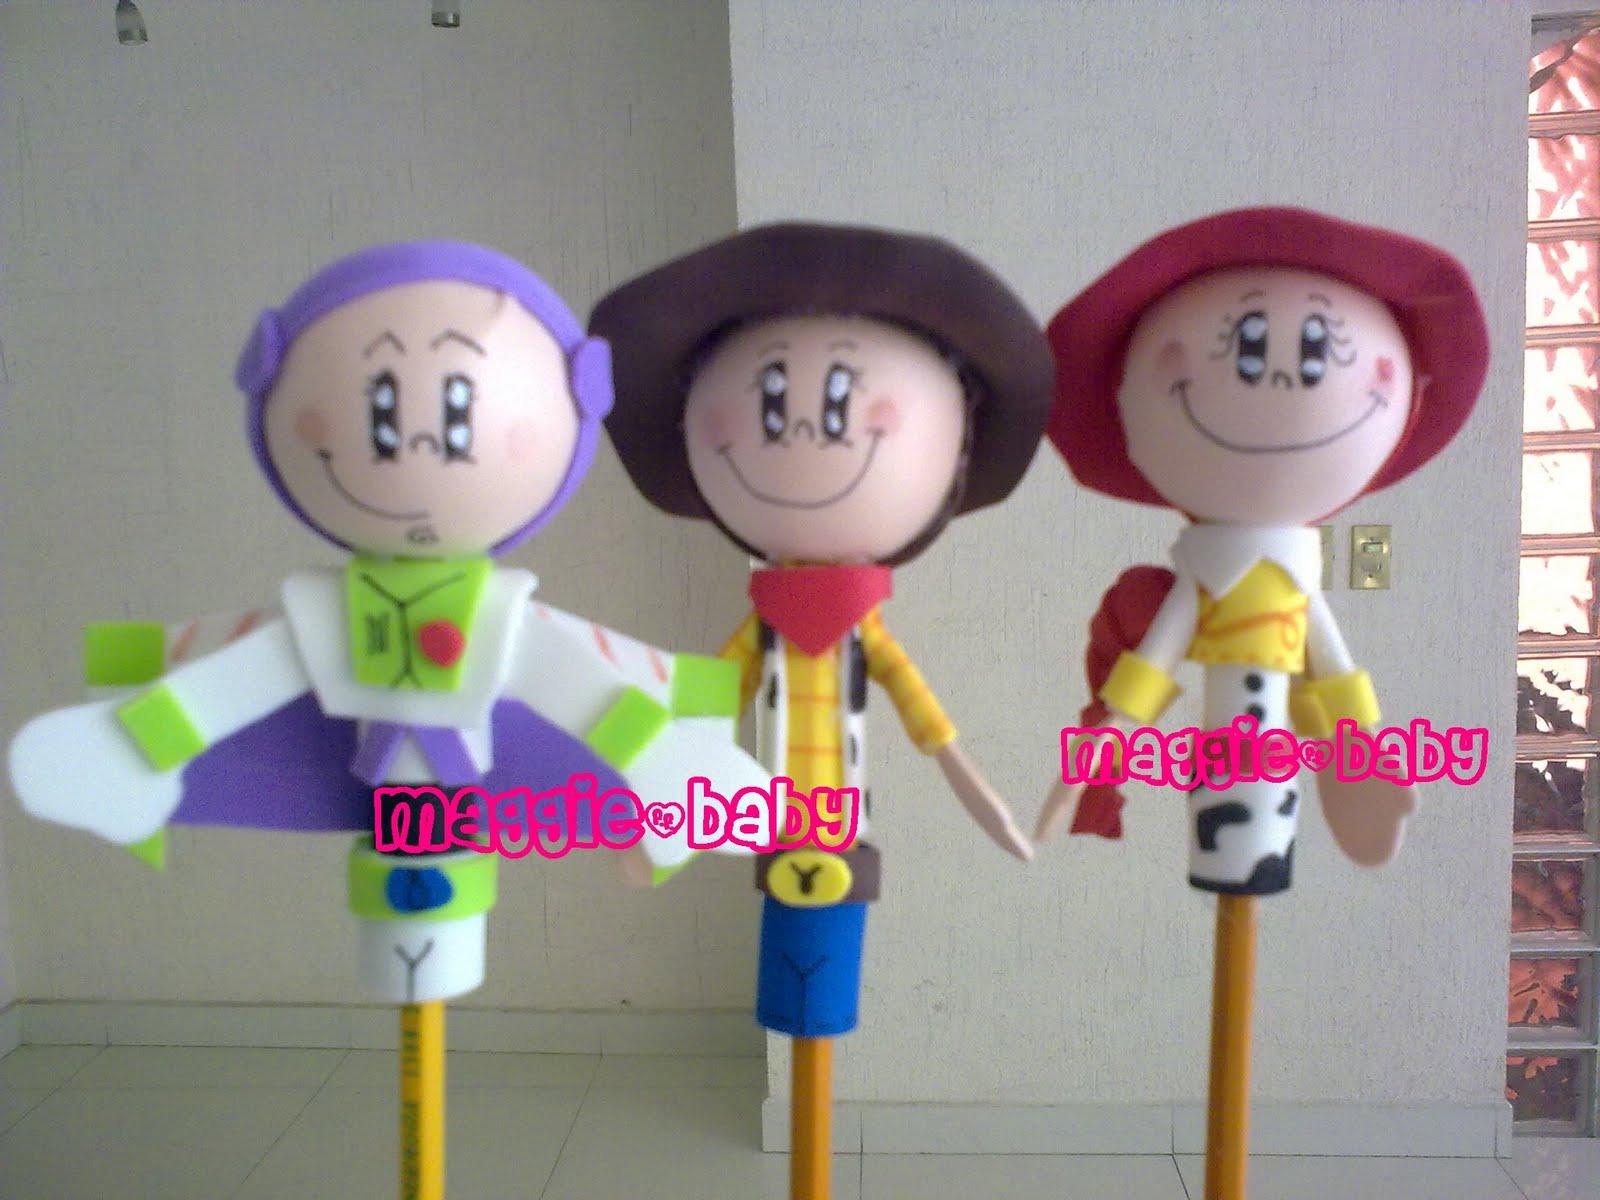 otros personajes de moda Buzz Lightyear, Woody y Jesse de Toy Story.